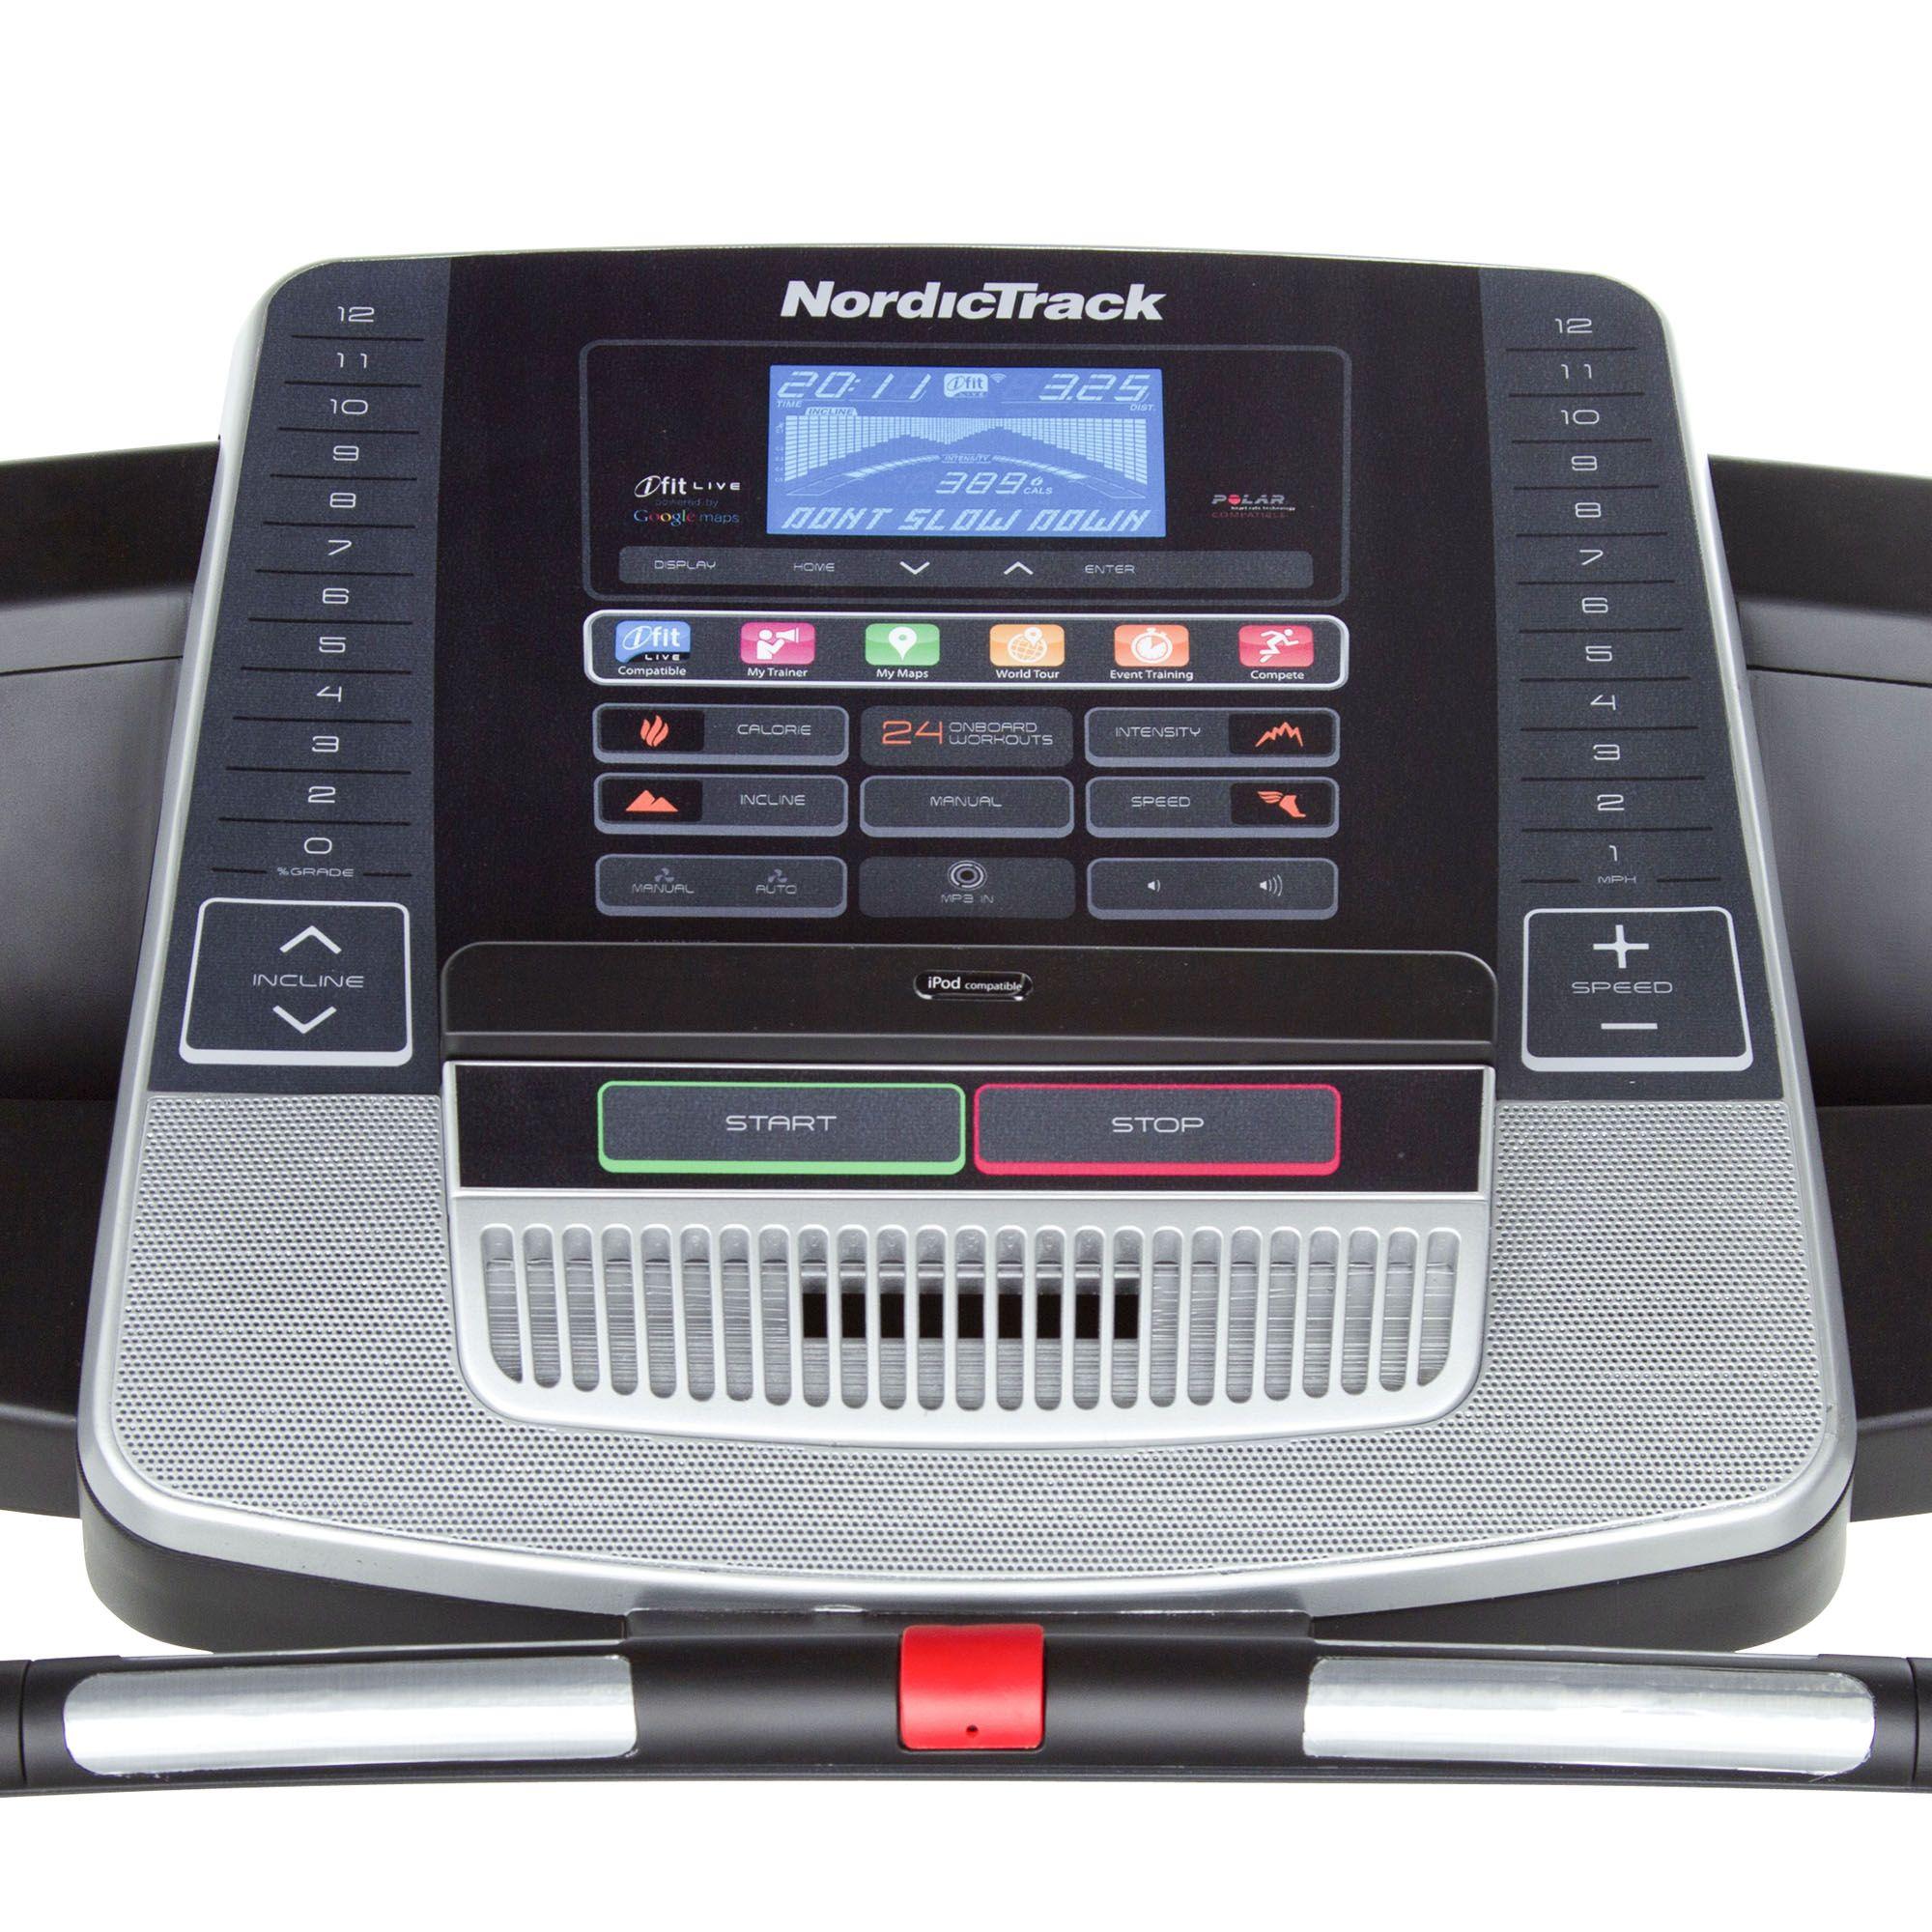 Proform 500 Treadmill price Acoustics 2 0 elliptical Manual